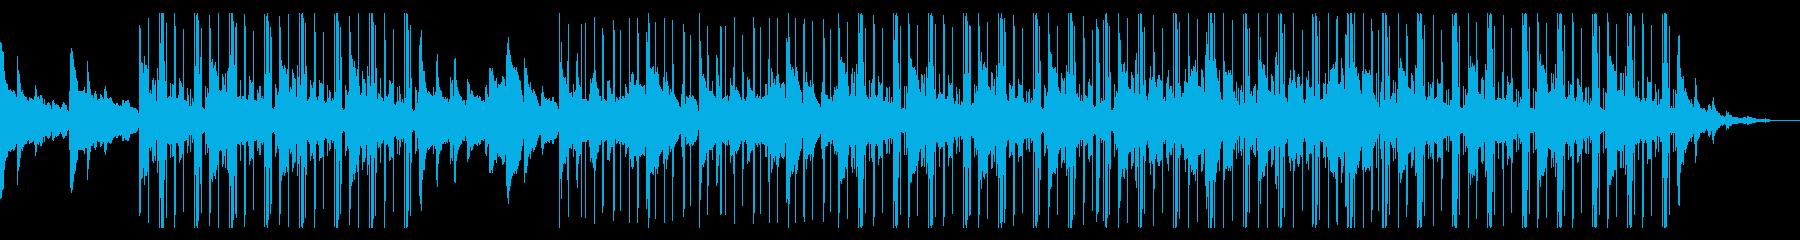 Lofi、月、夜、ピアノ、チルアウトの再生済みの波形